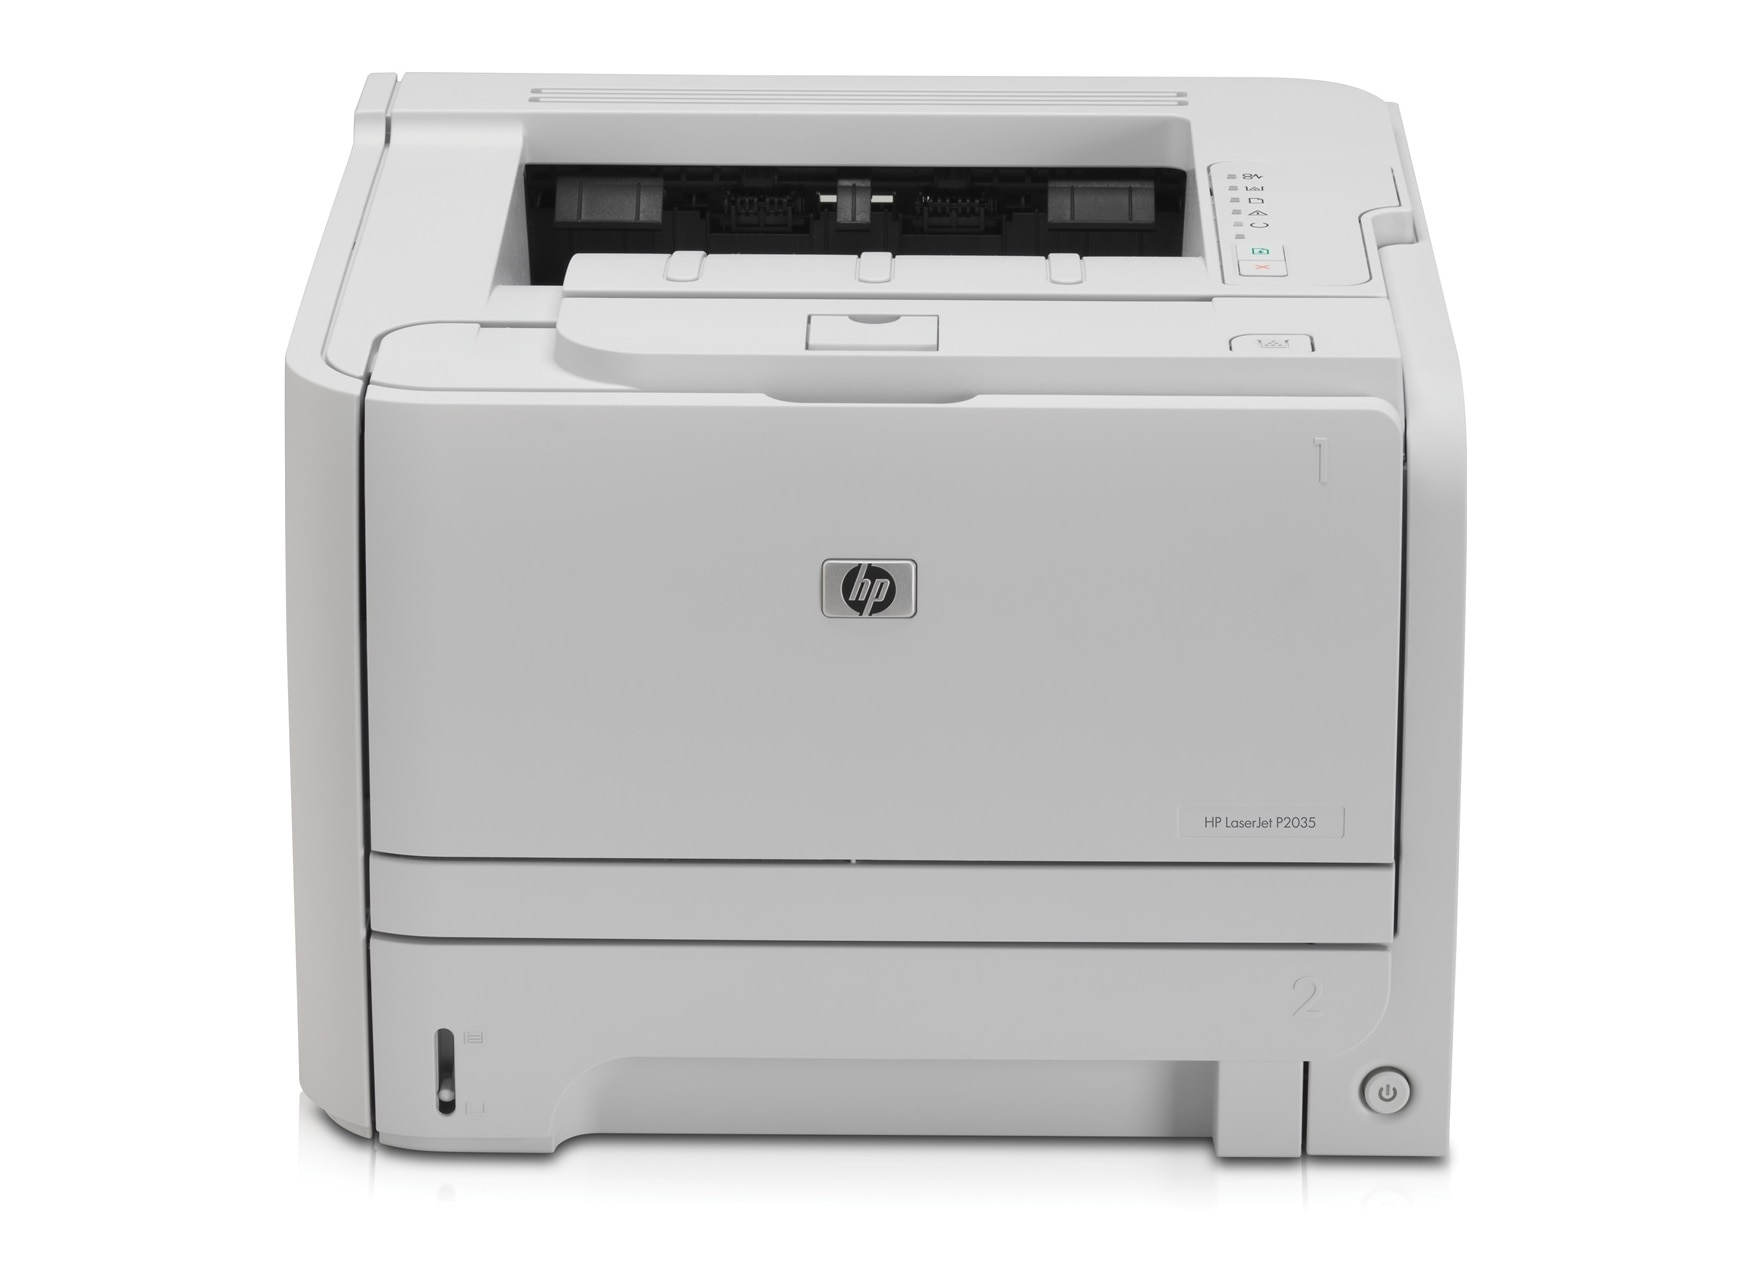 Impresora Hp Laserjet P2035 Hp Store Espa 241 A